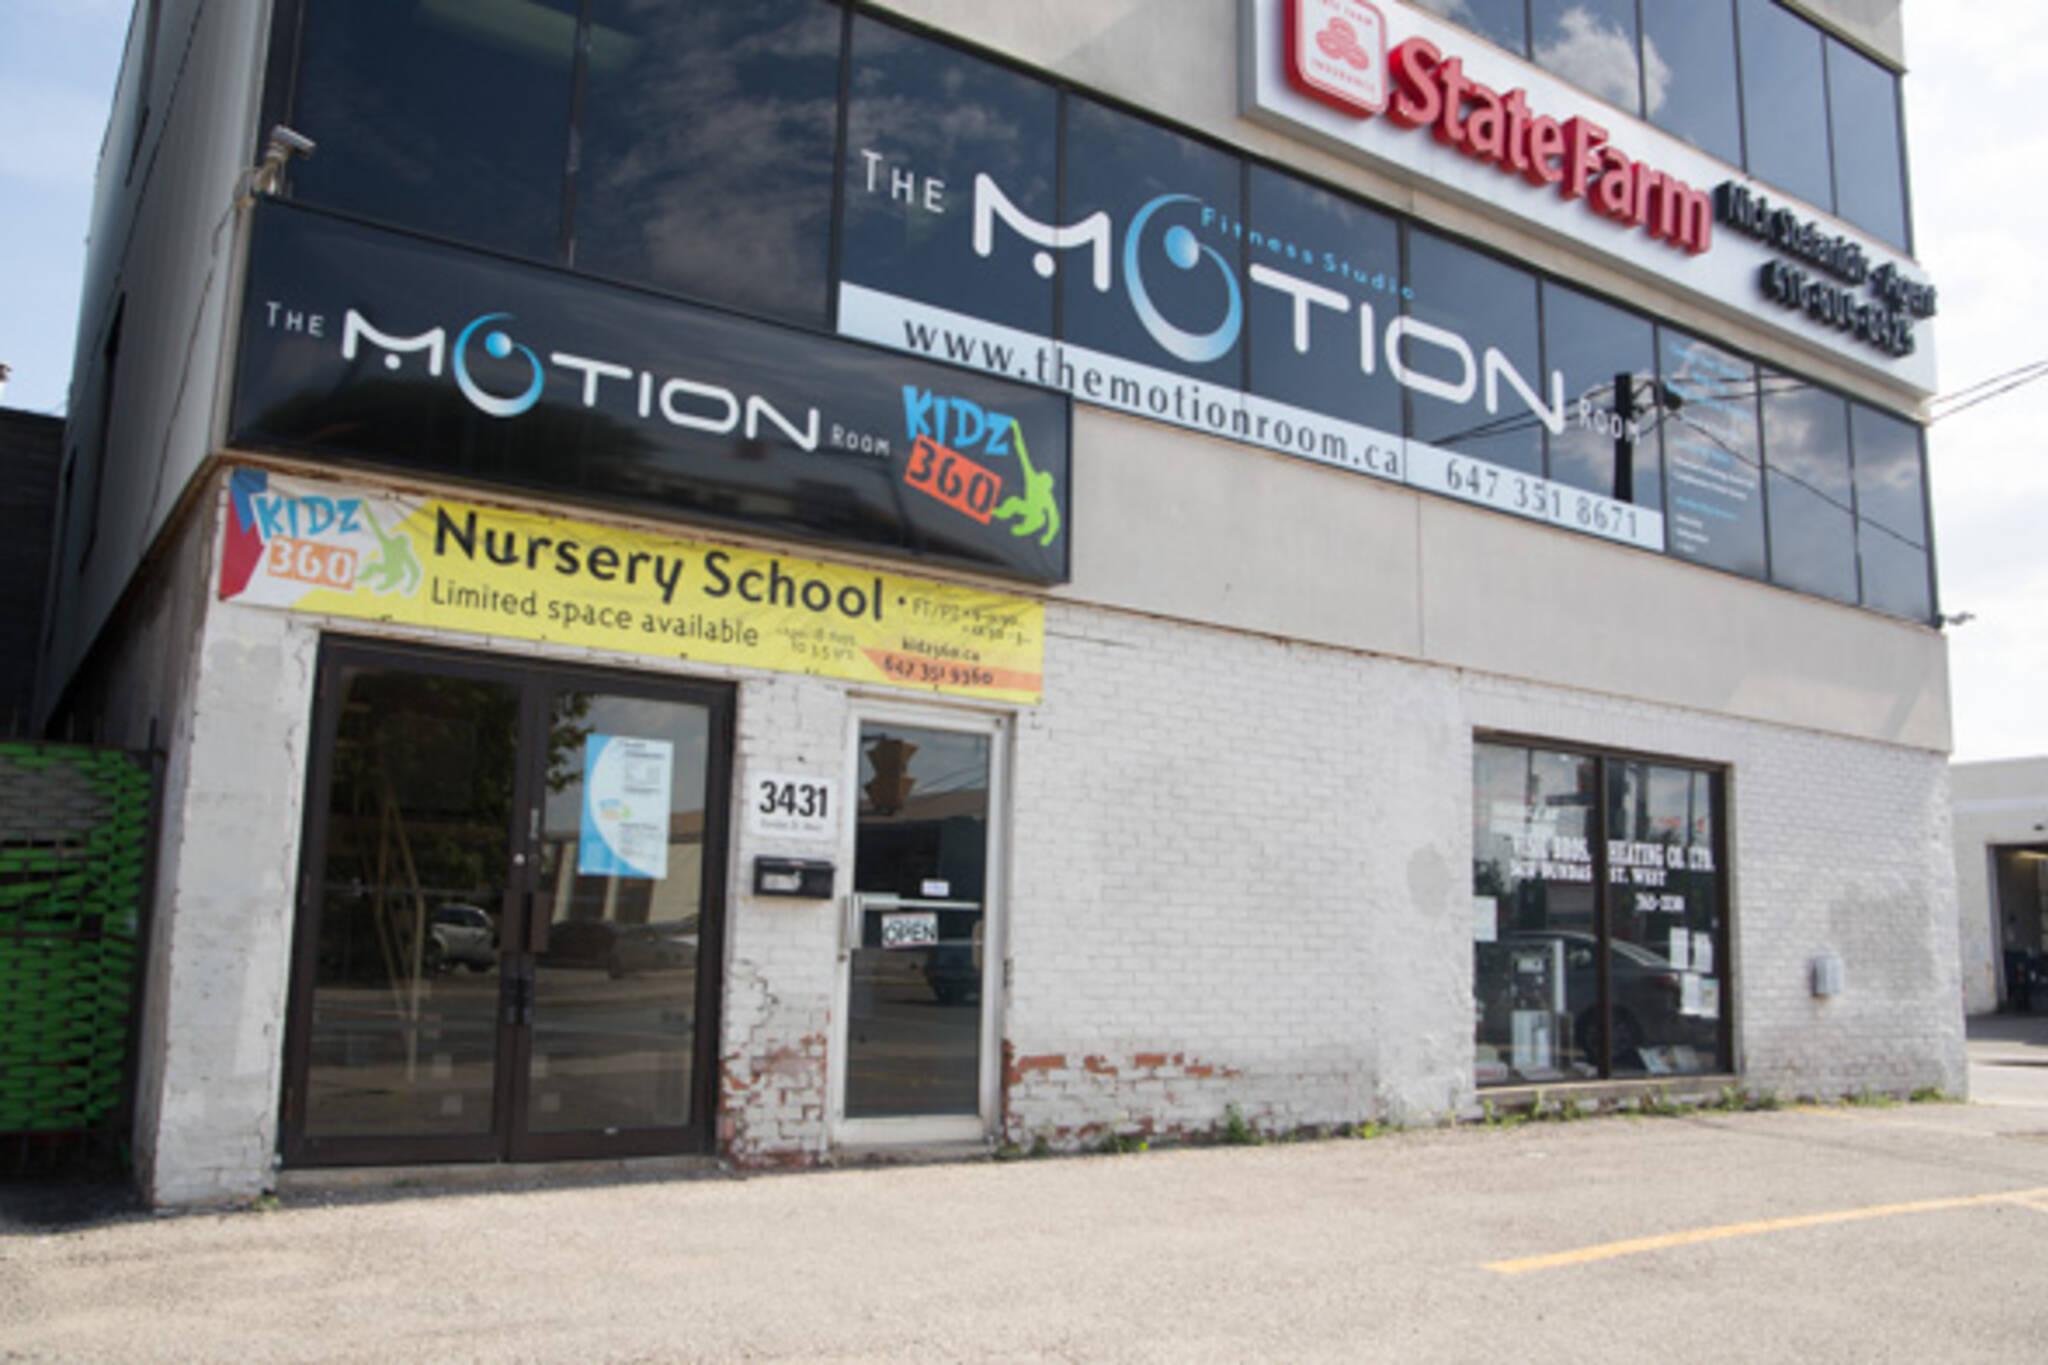 The Motion Room Toronto